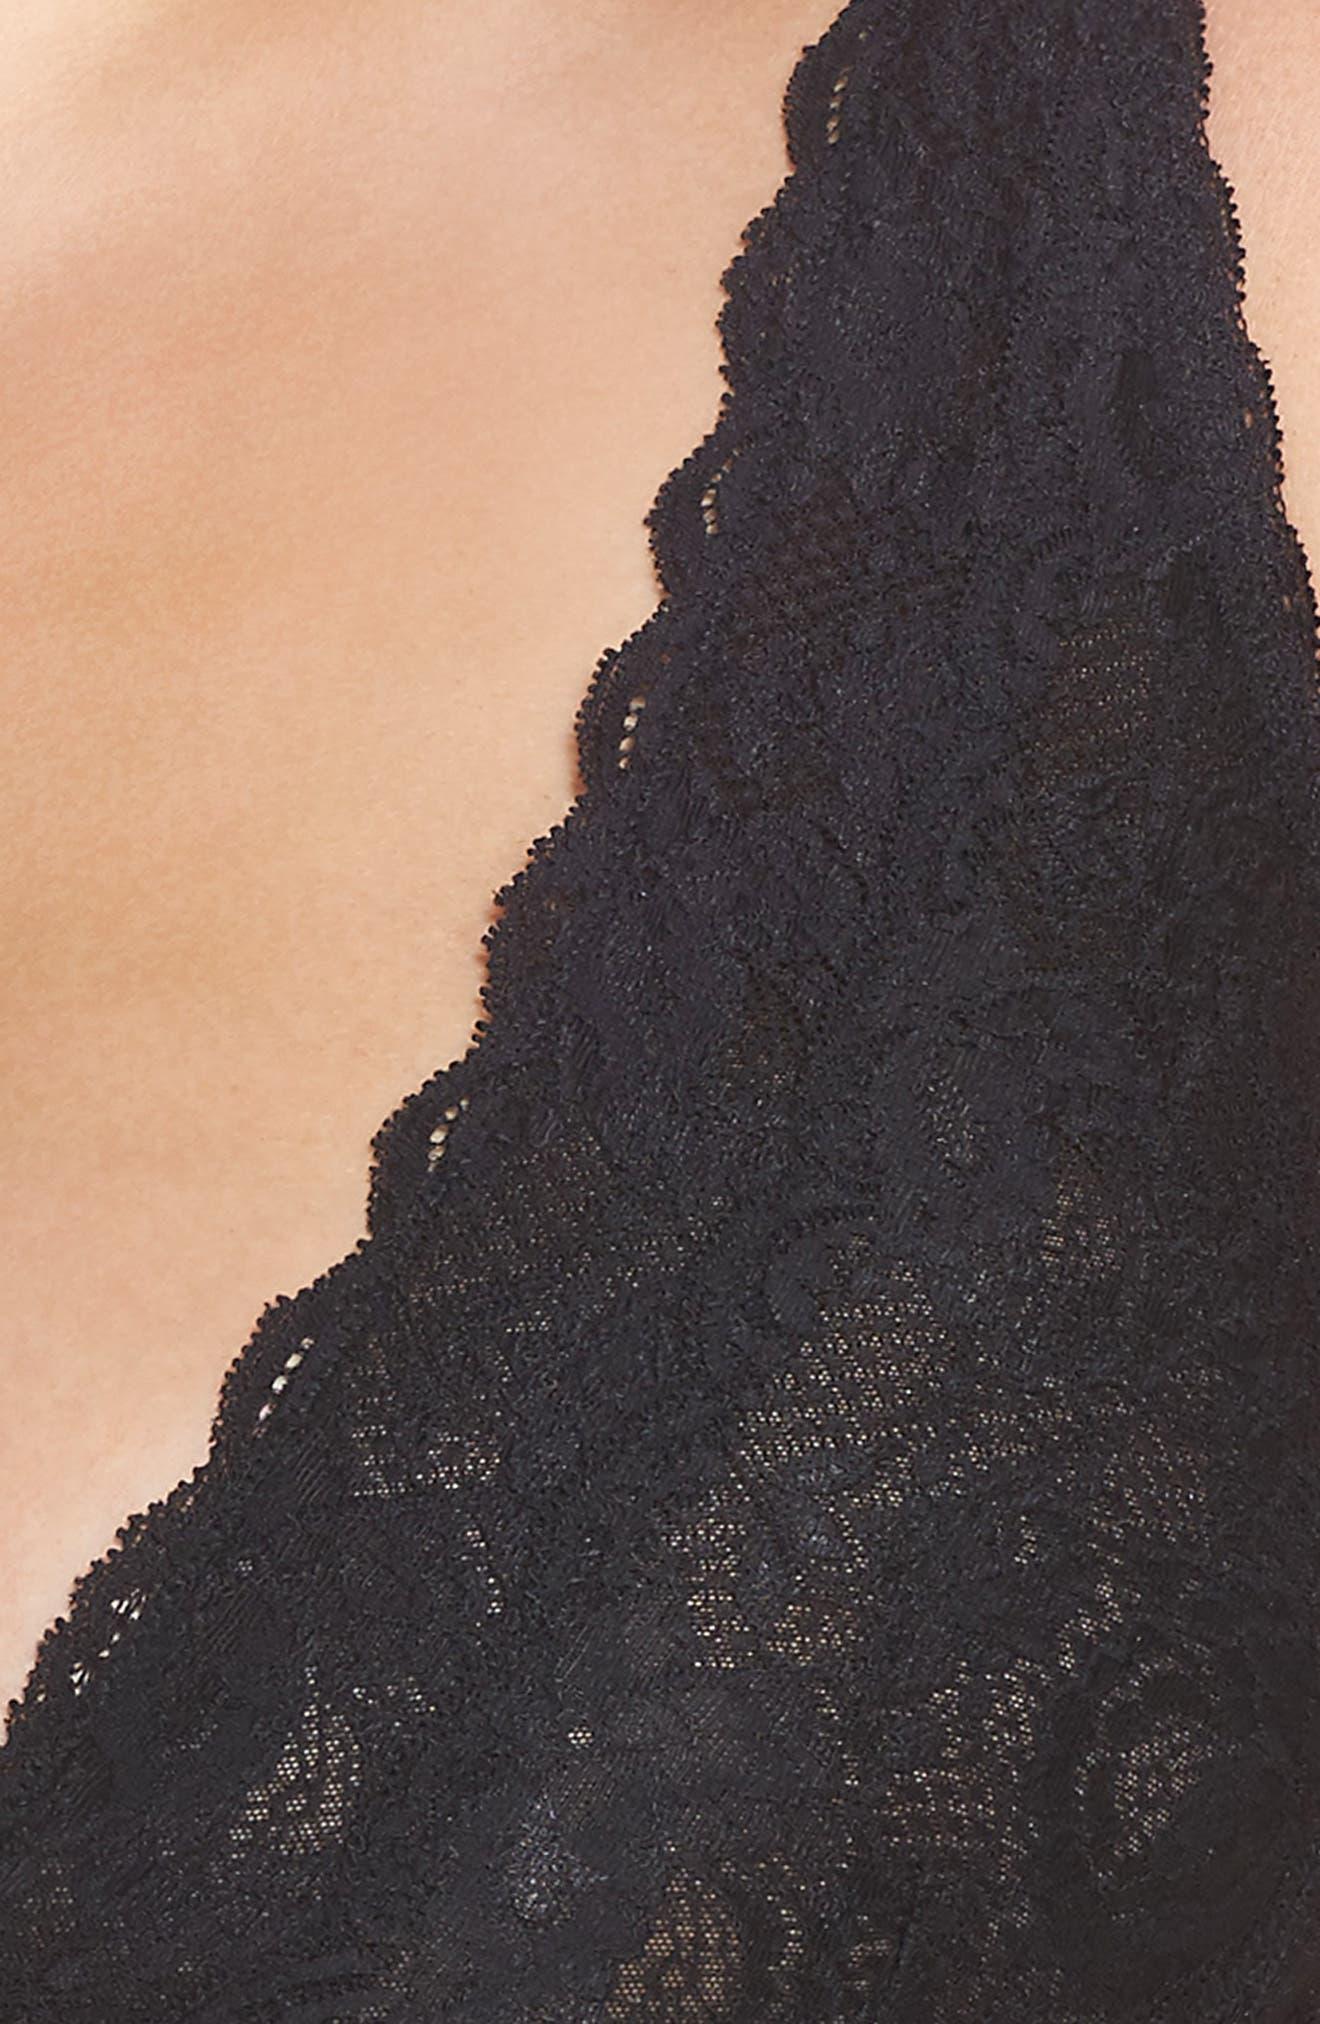 Cosabella Never Say Never Plungie Lace Longline Bralette (Plus Size)